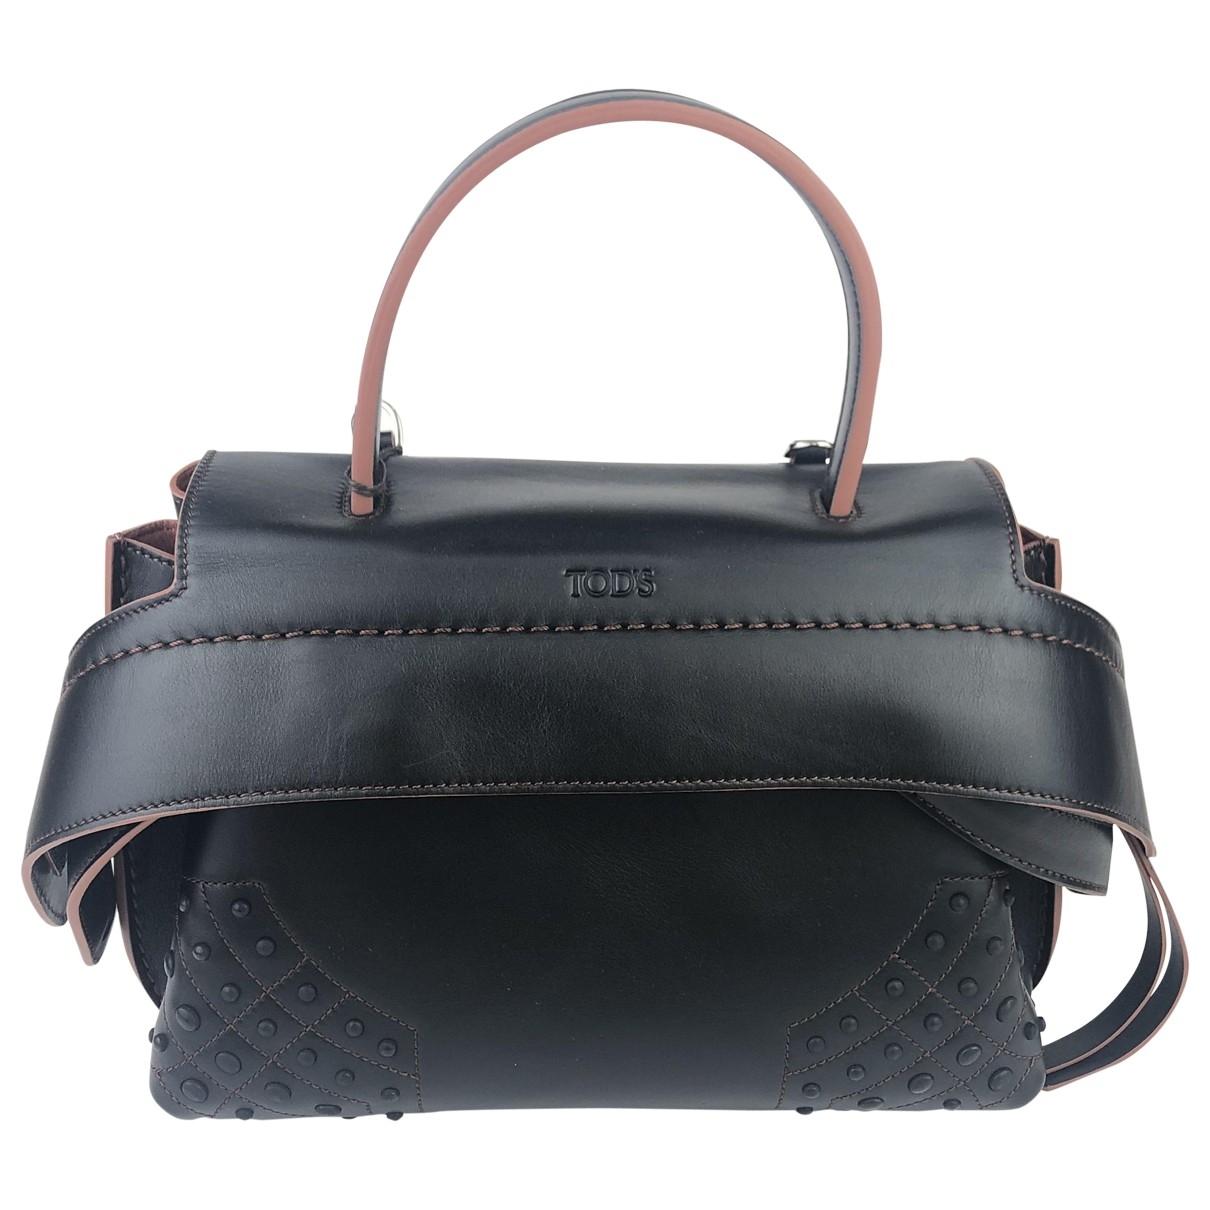 Tods Wave Handtasche in  Schwarz Leder